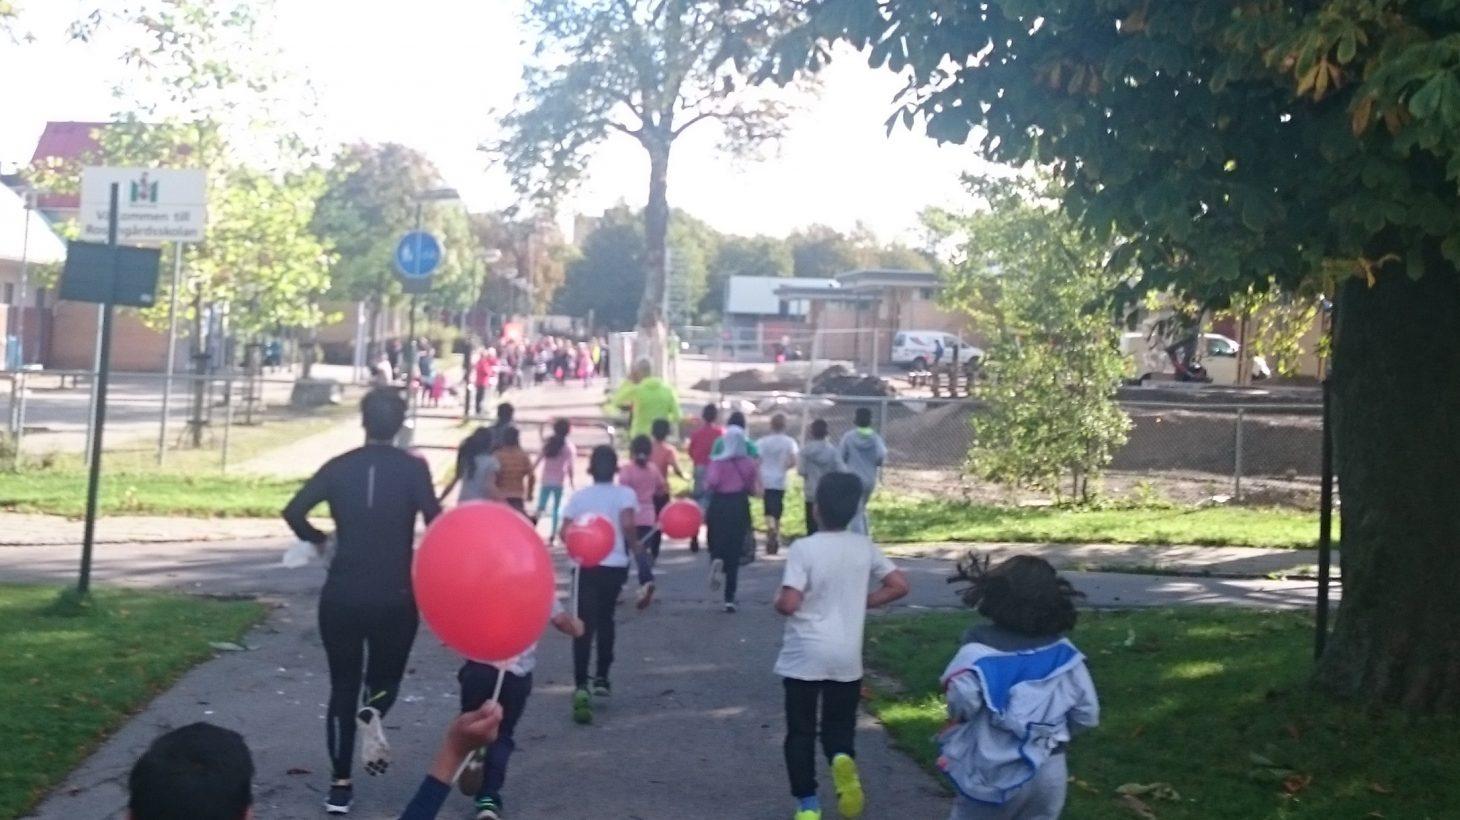 Barn springer på gångbana.